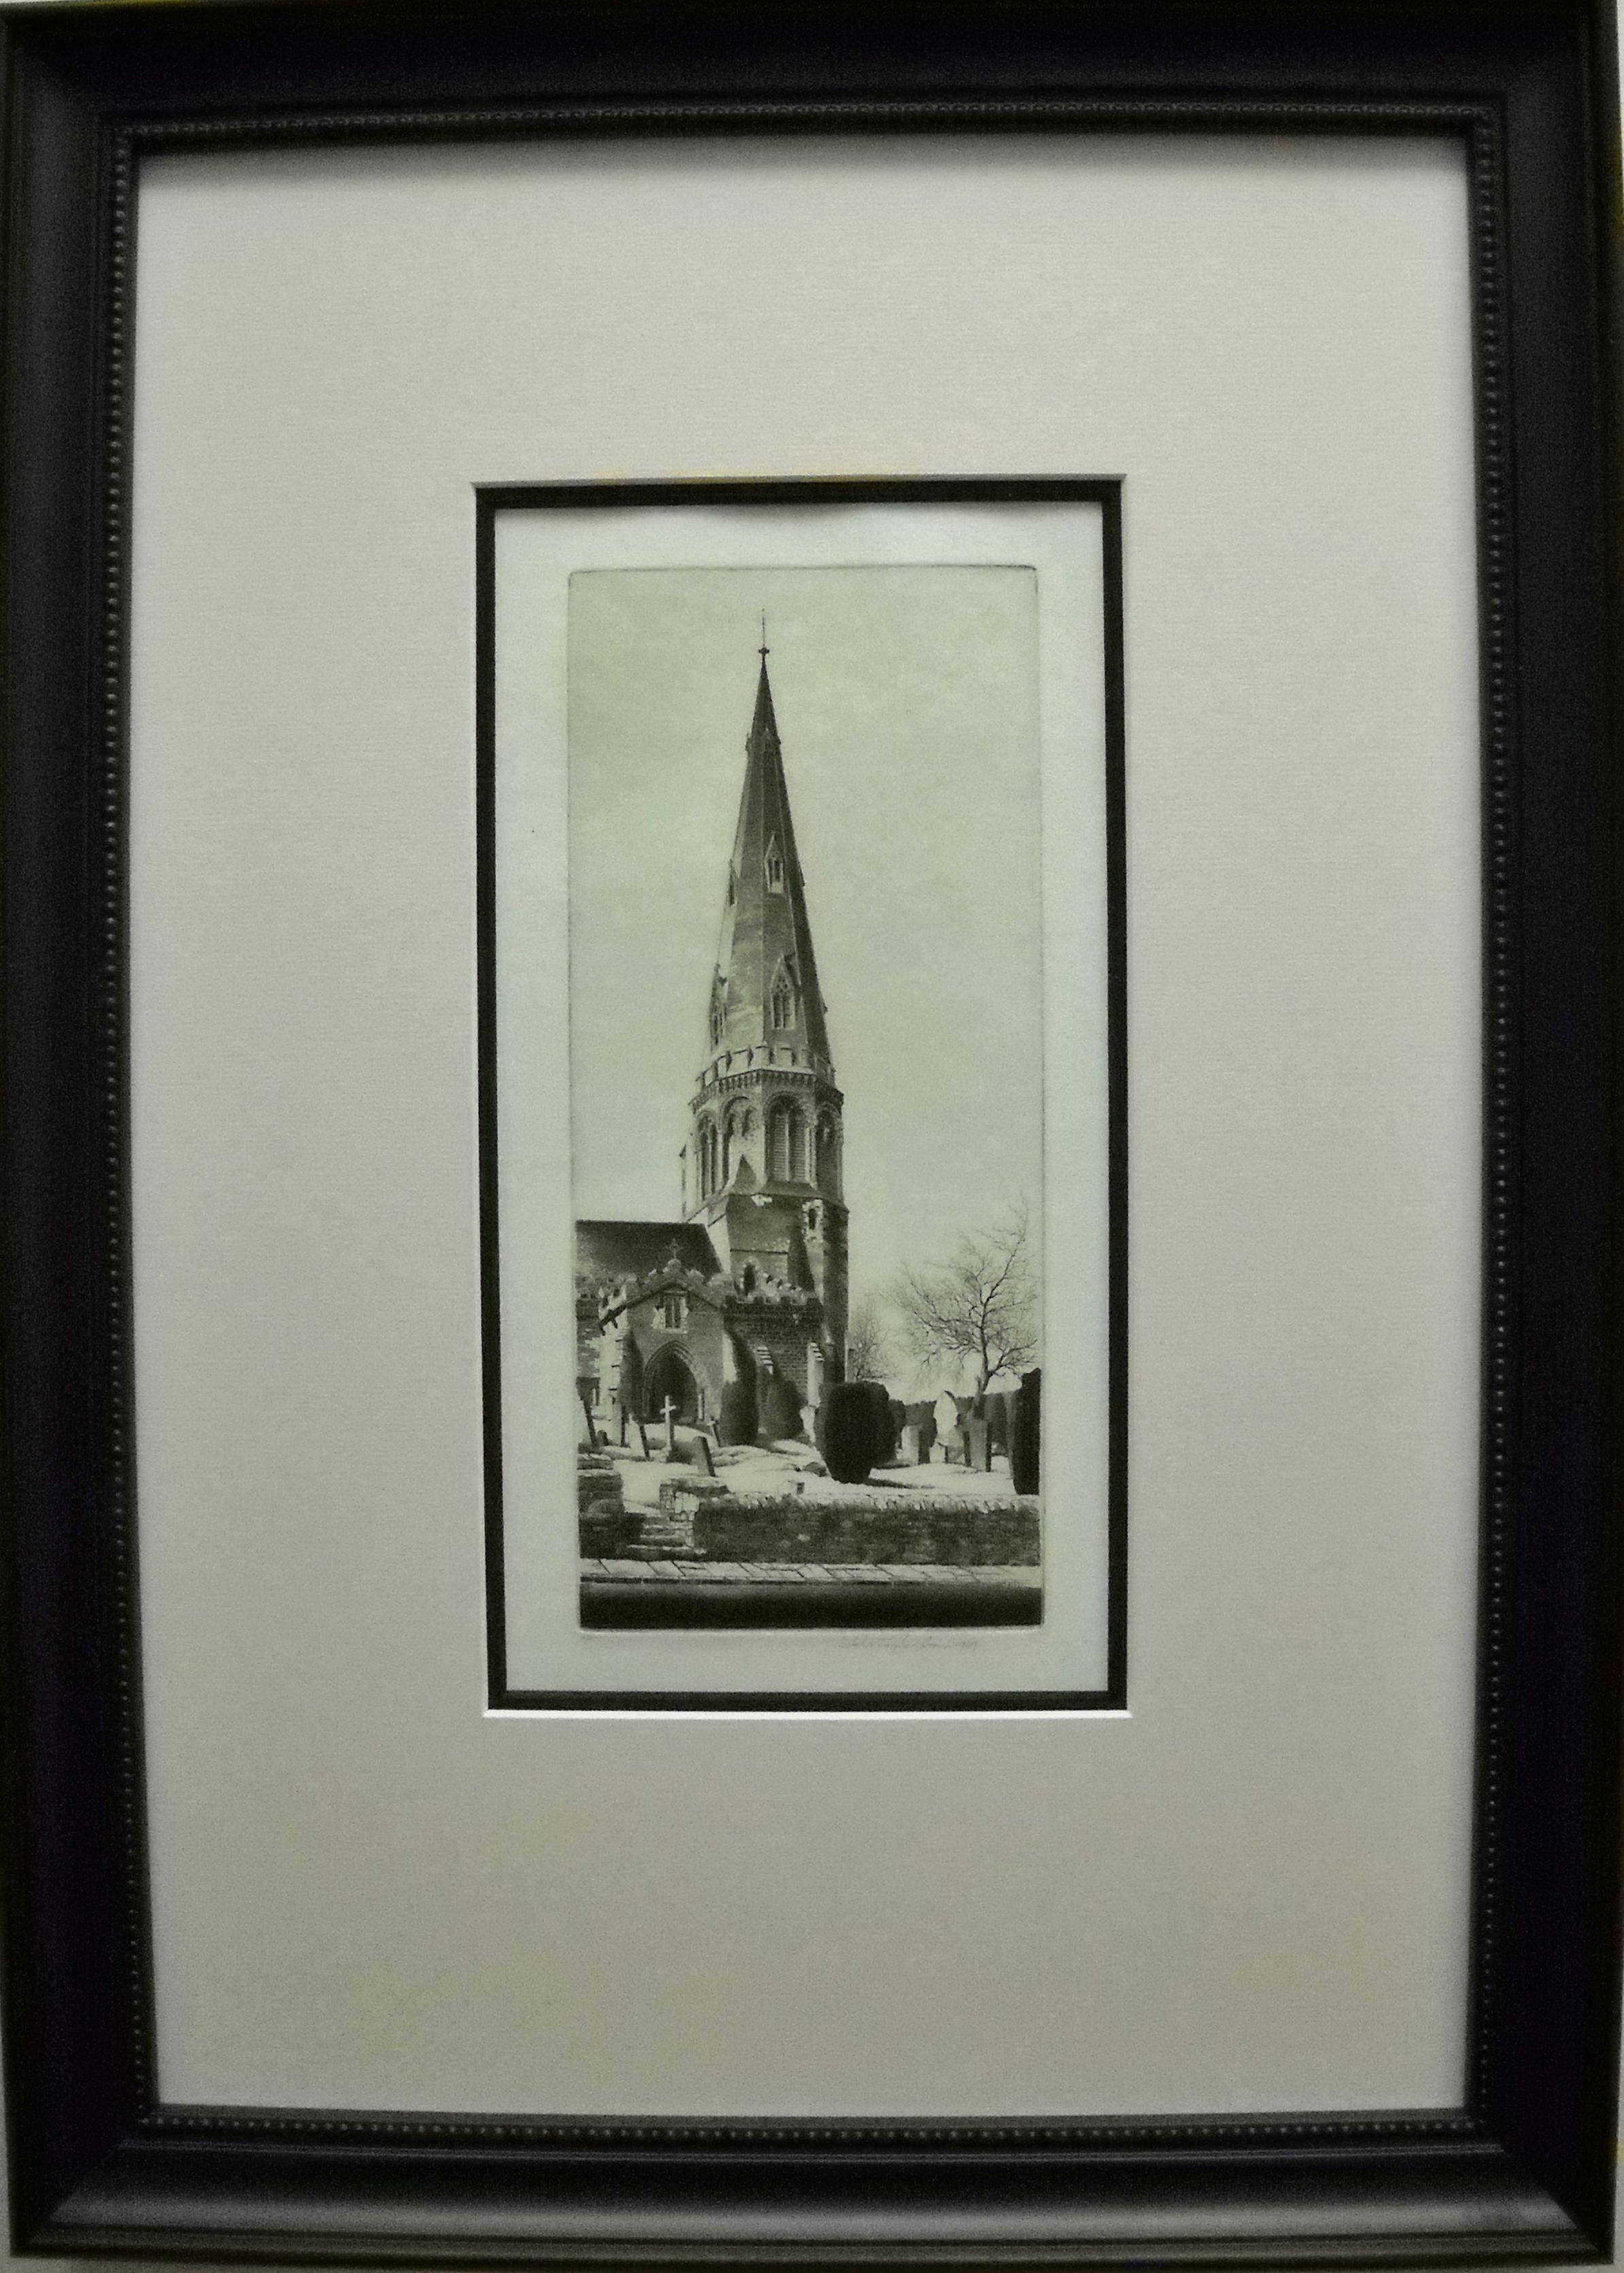 John Taylor Arms etching print